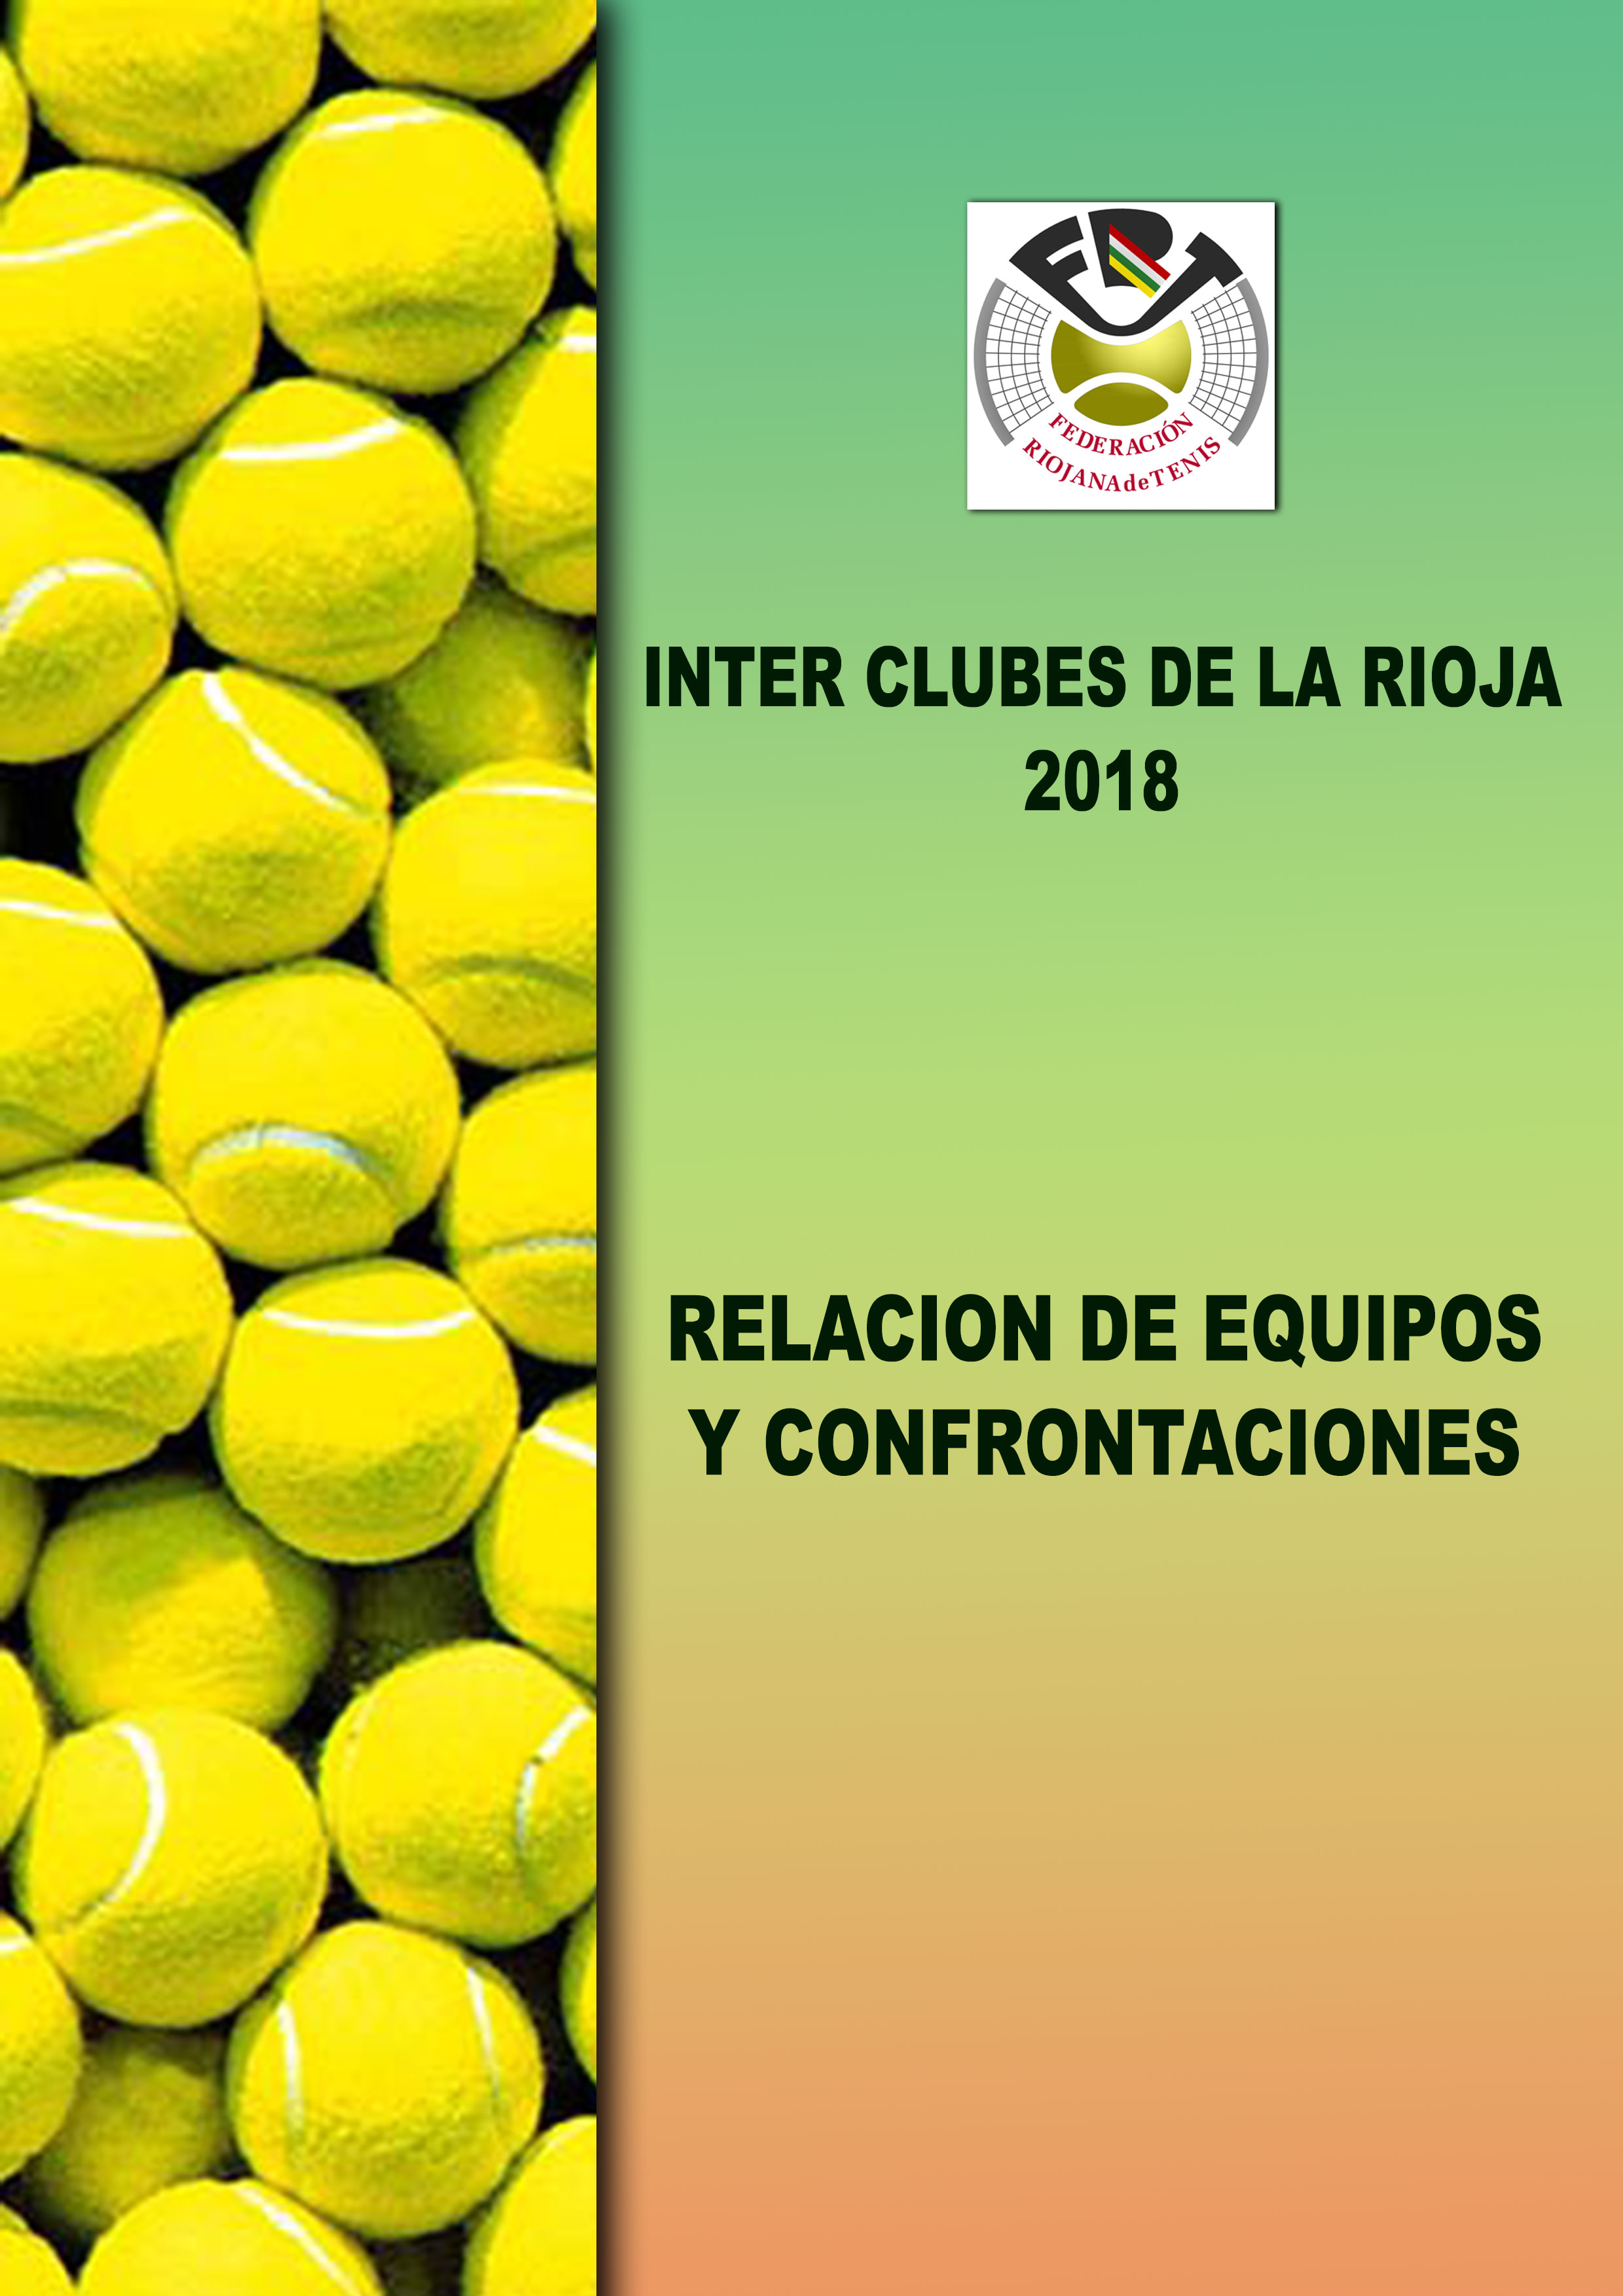 Inter Clubes de La Rioja